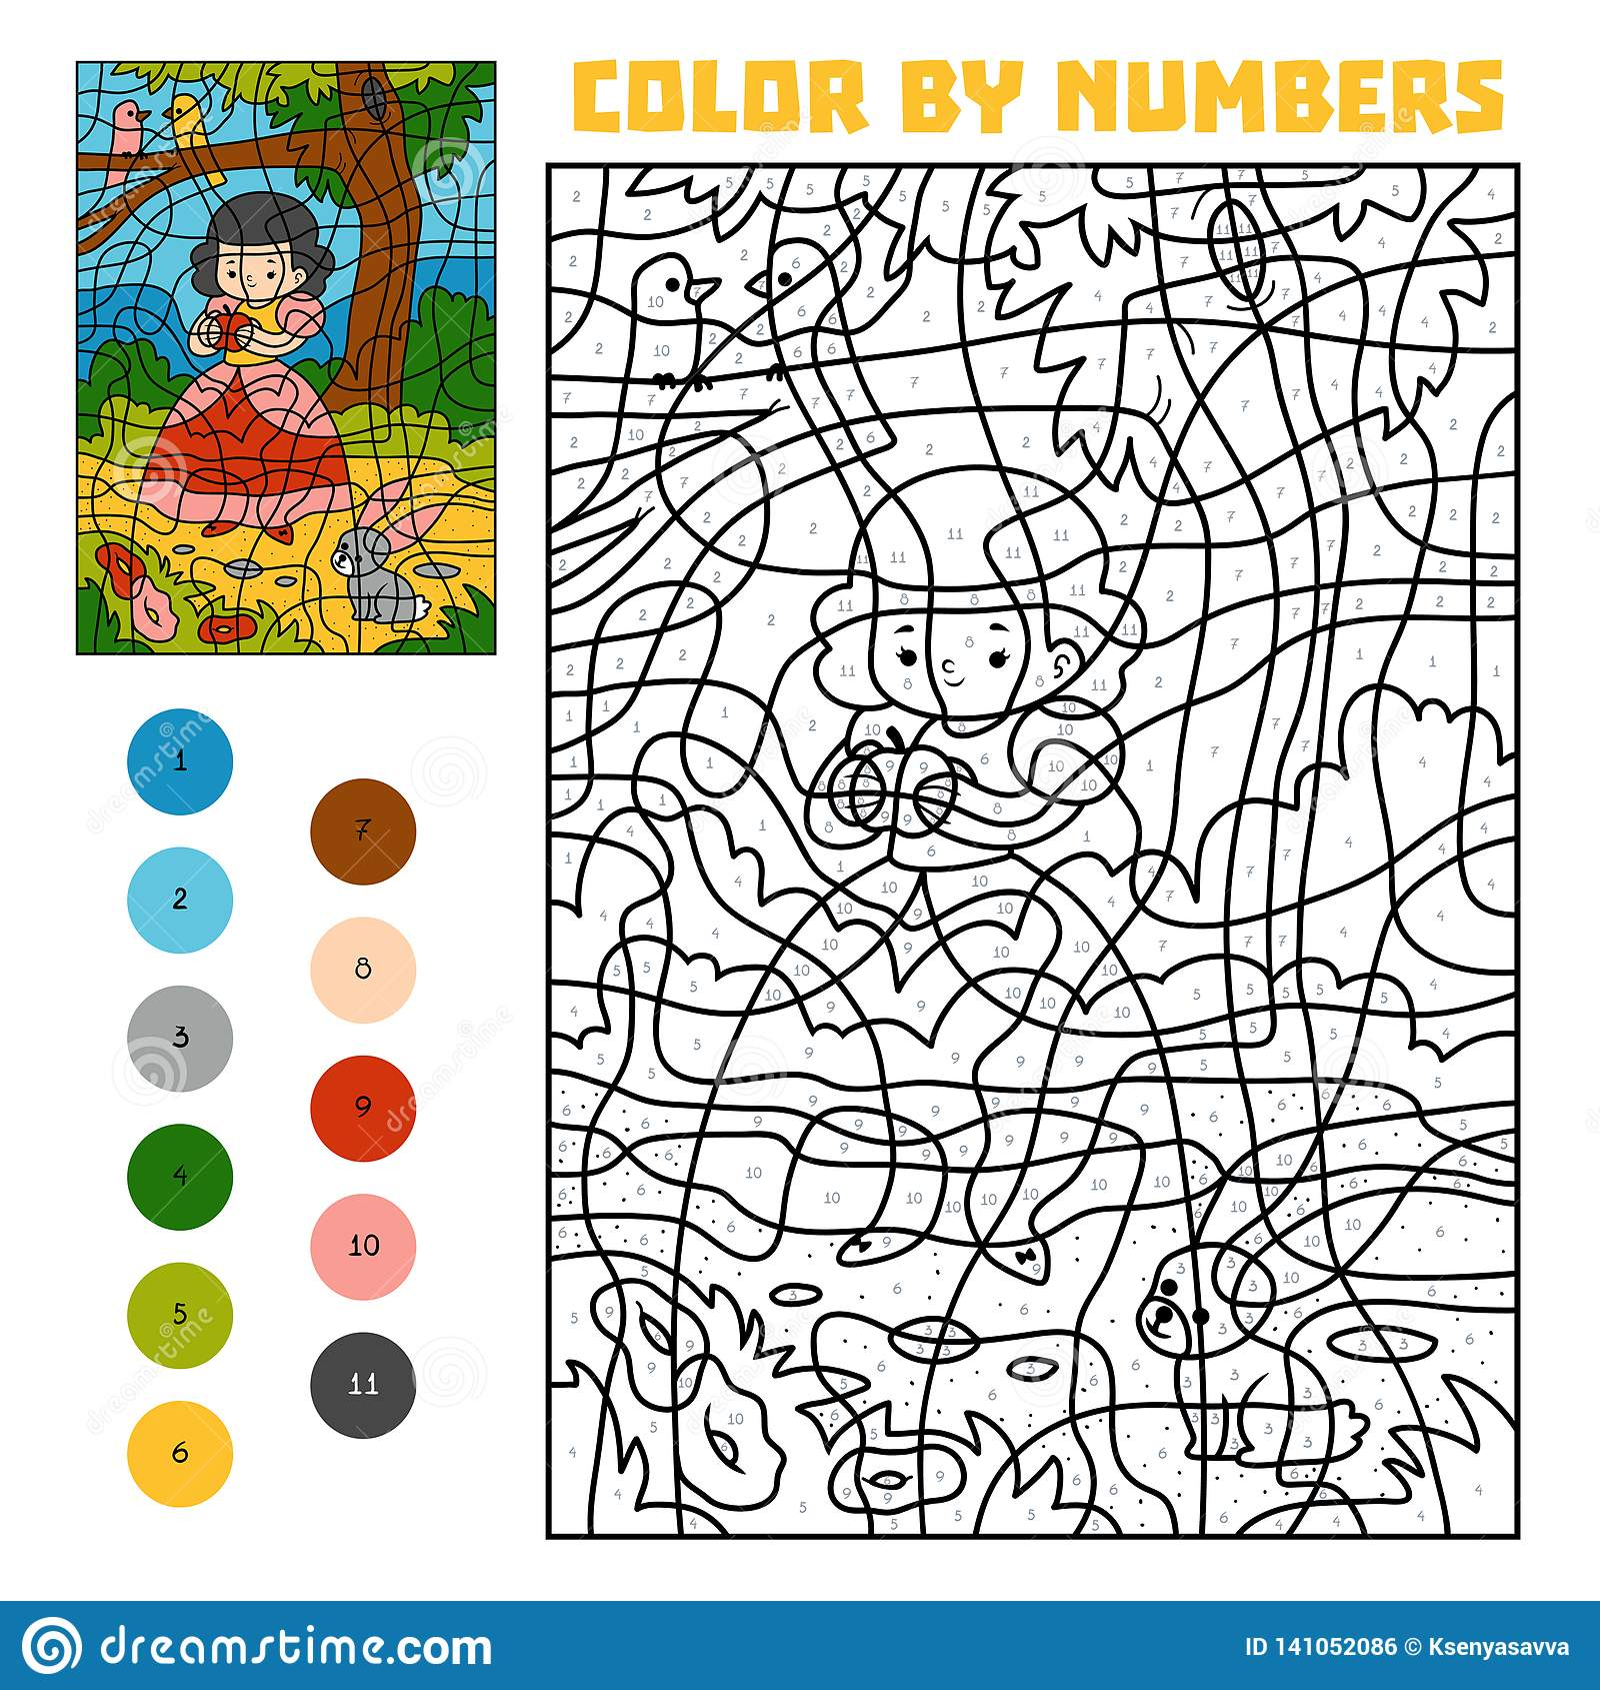 Kleur door aantal Sprookjes Sneeuwwitje en appel